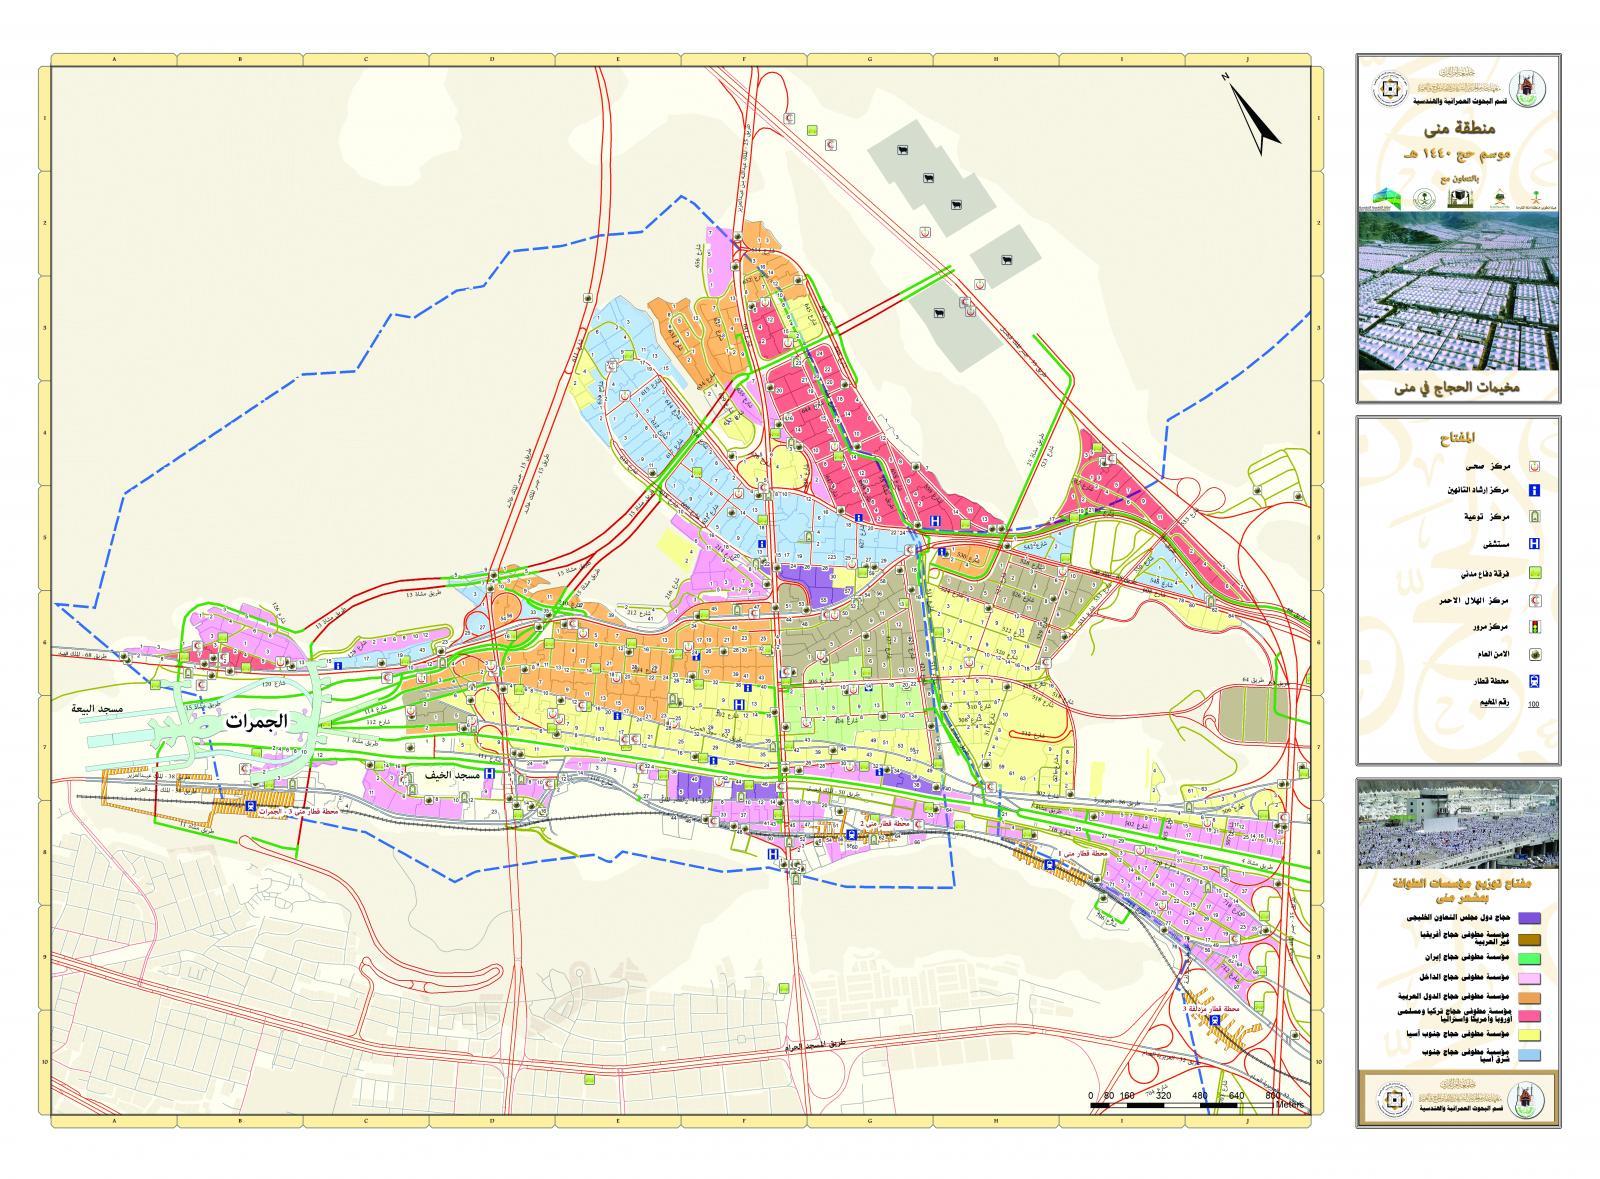 arafat maps – hajj guide – blog